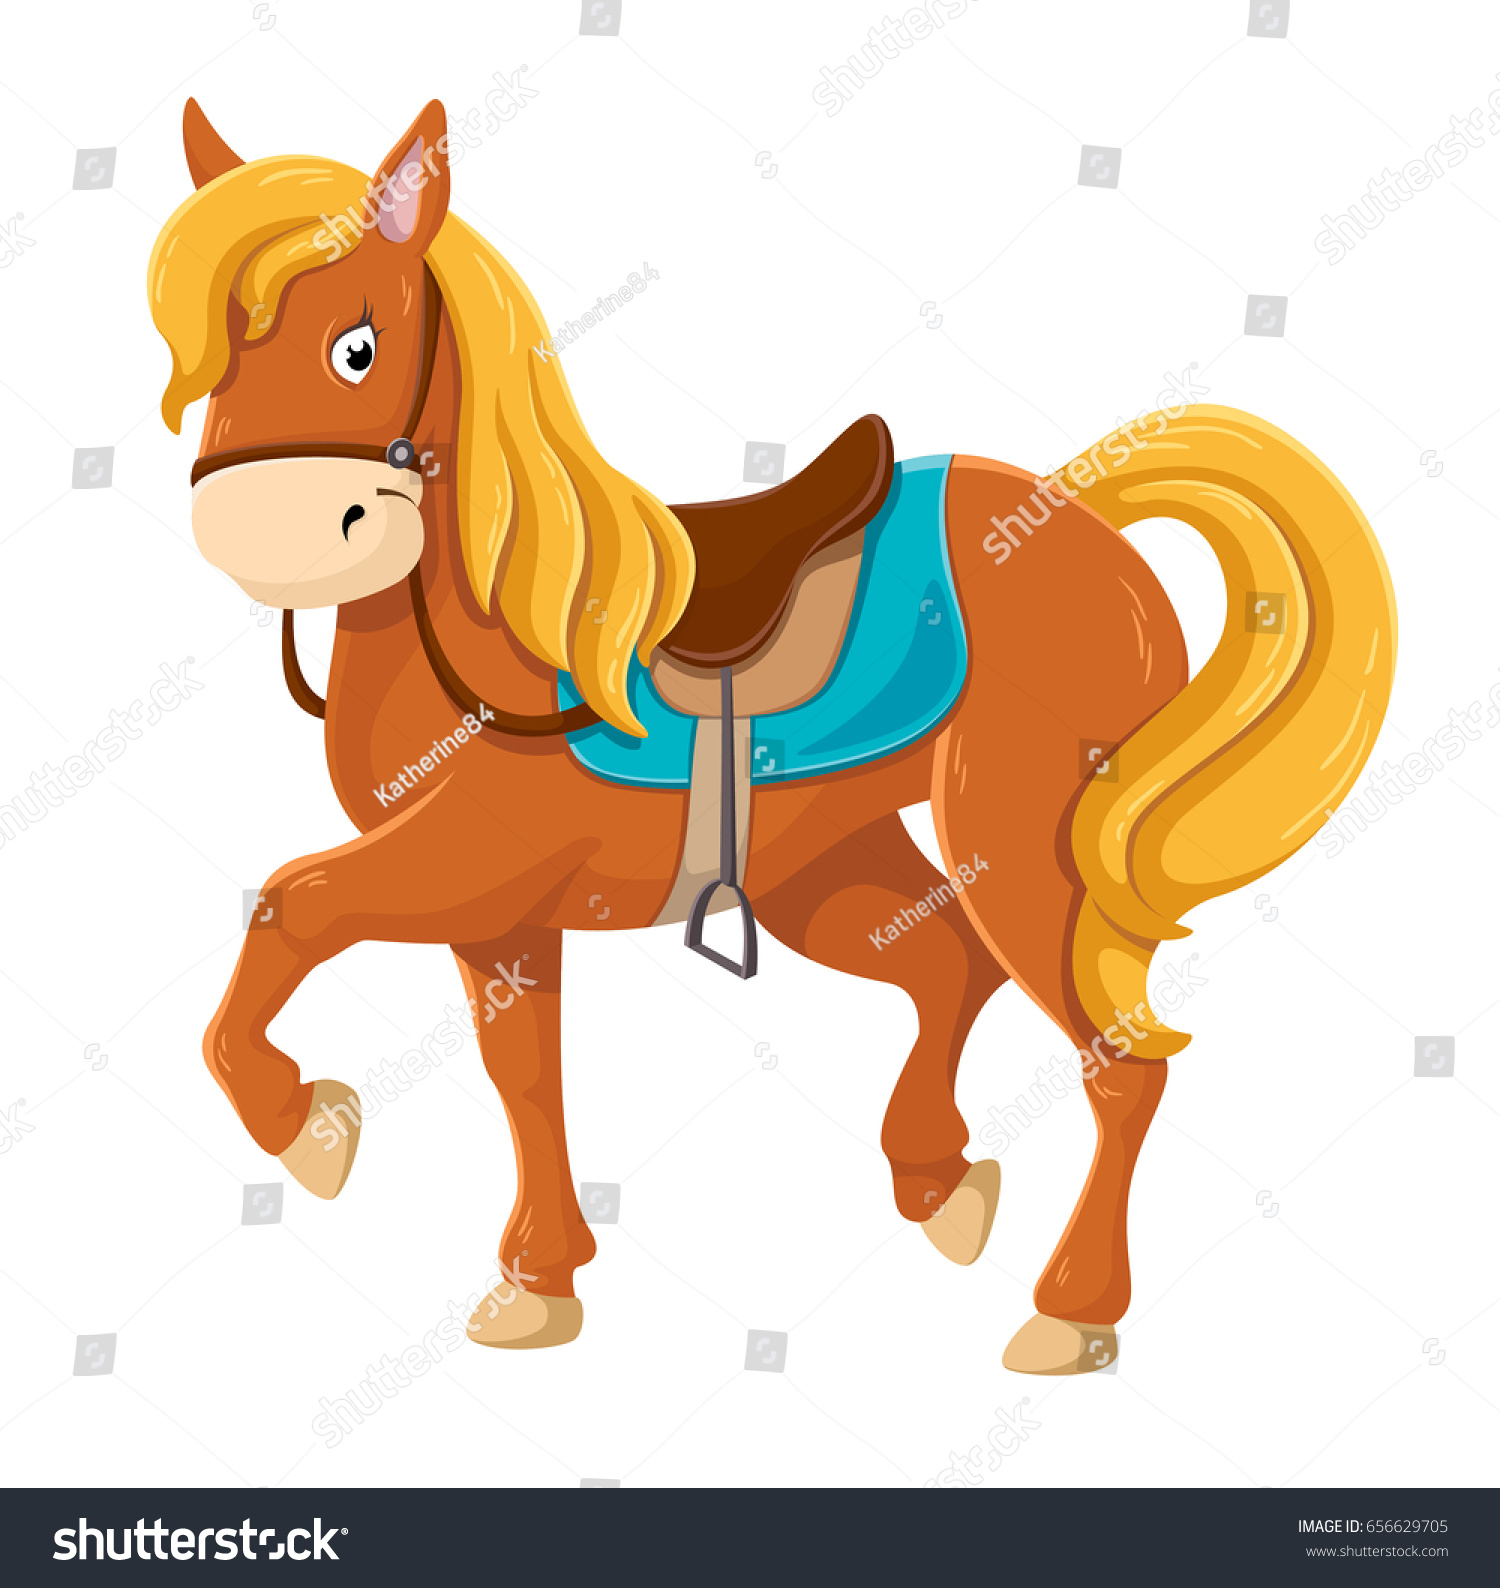 Cute Cartoon Horse Illustration Stock Vector Royalty Free 656629705